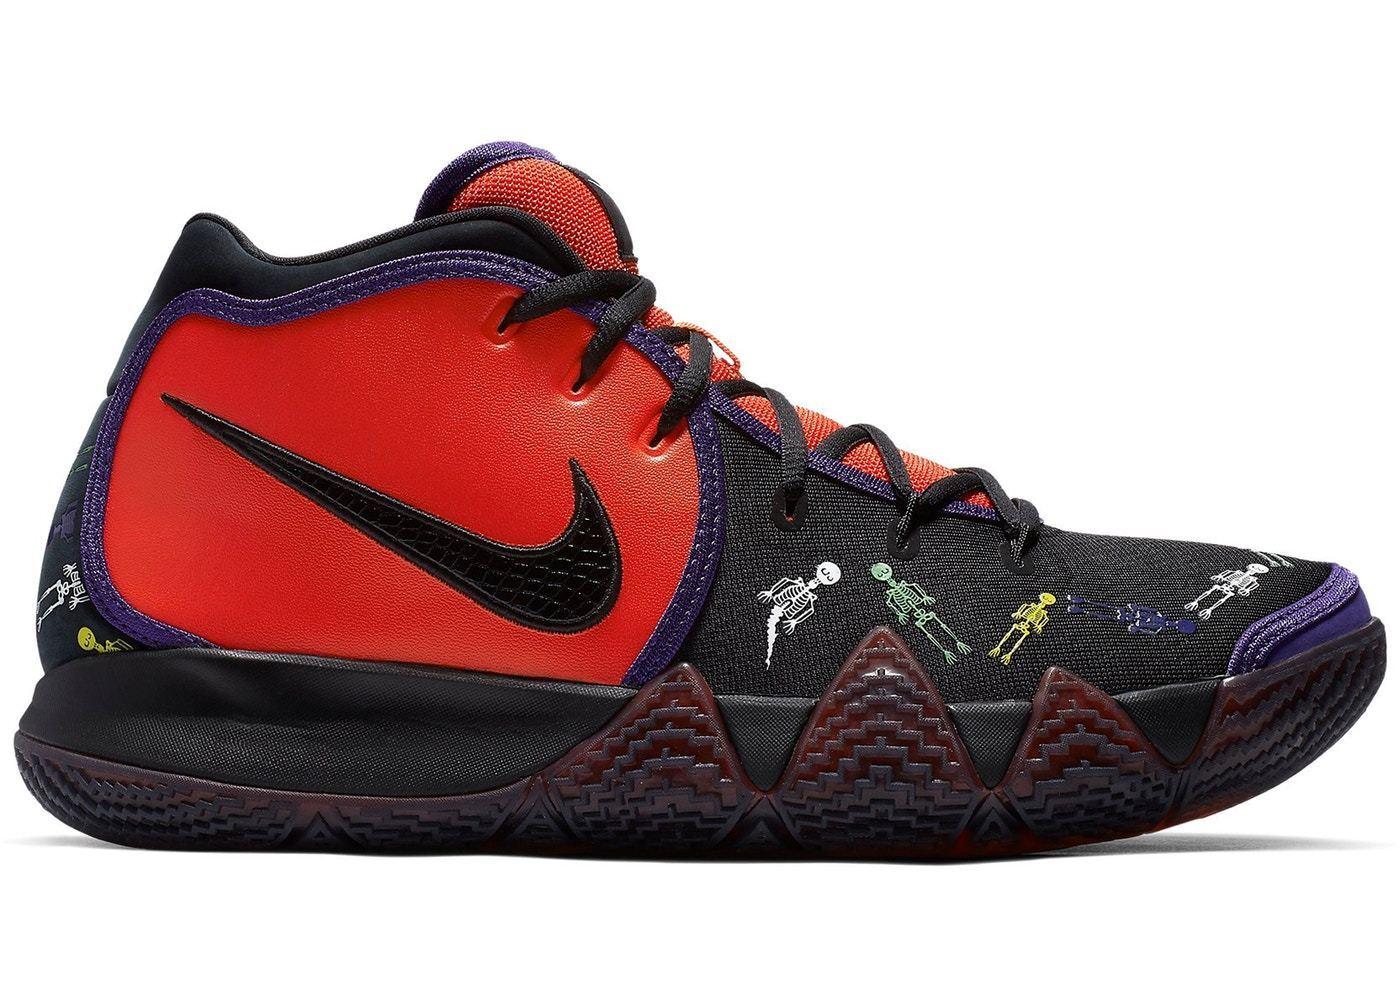 Nike Nike Nike Kyrie 4 DOTD size 12.5 Day of the Dead. Black Purple .Halloween. CI0278-800 0da9eb